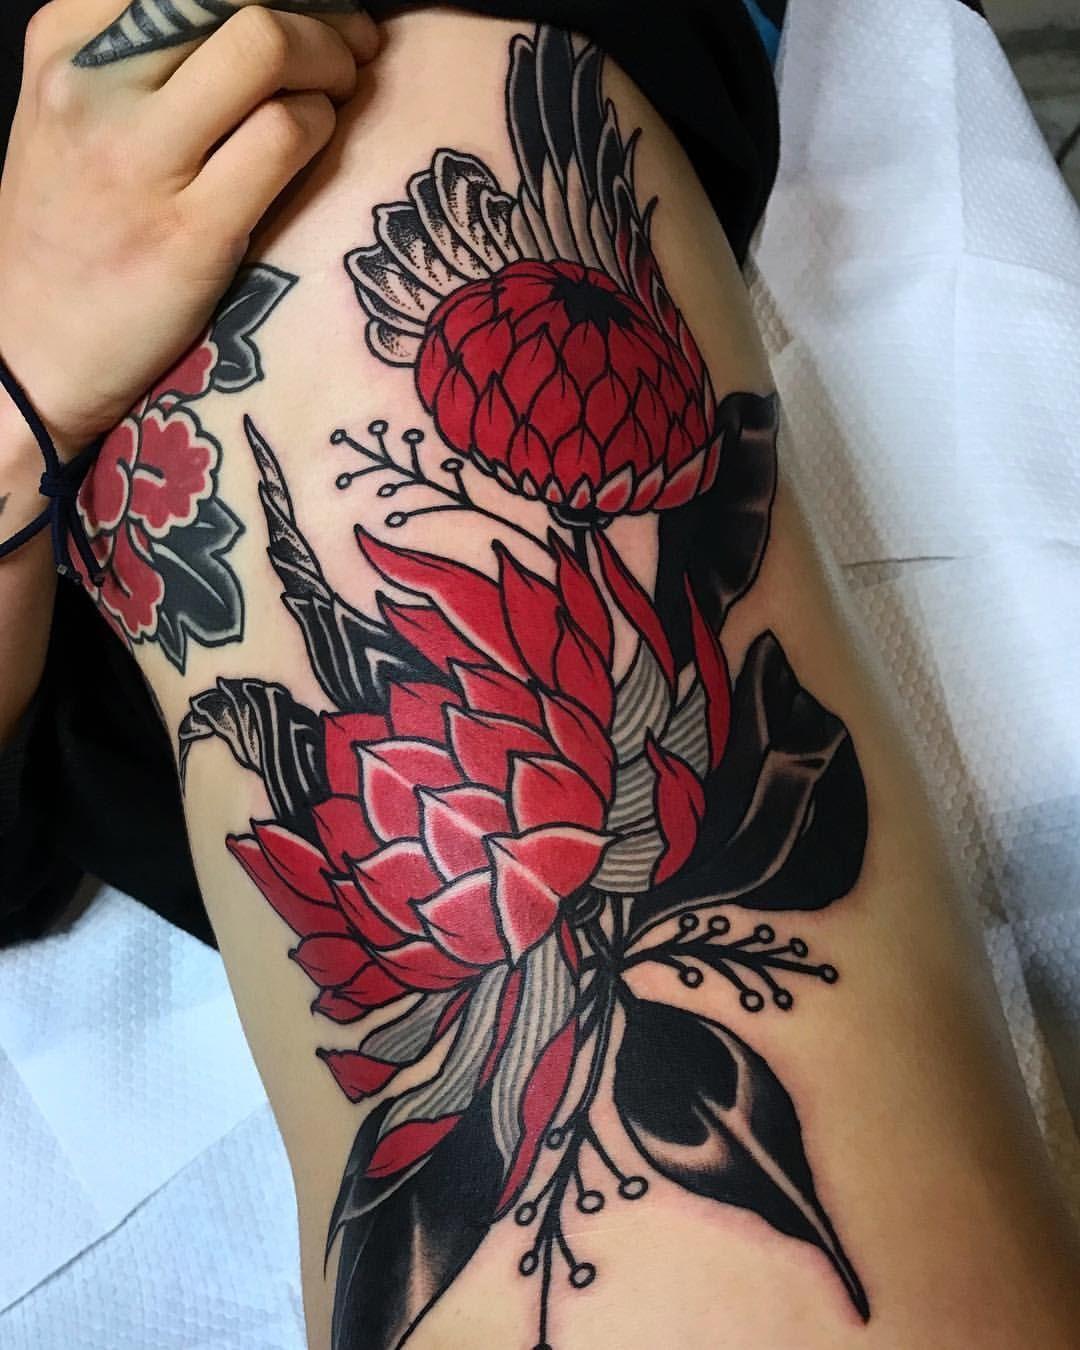 Pin By Mytorius On Believe Tattoo Men: EVGENIA SIN